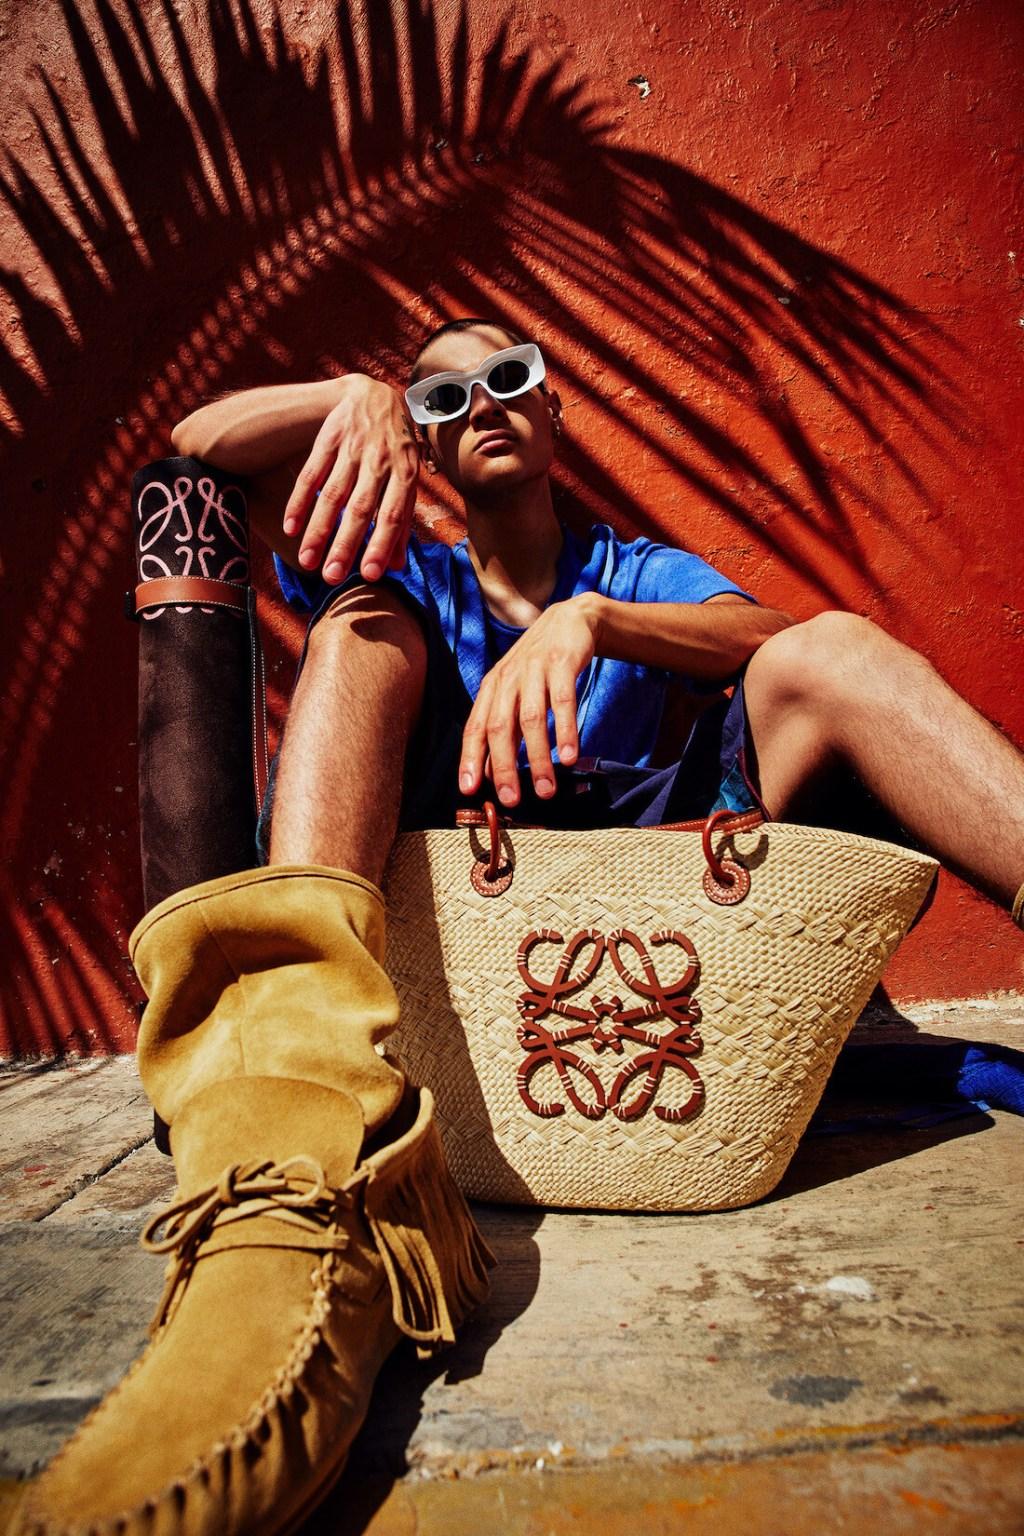 Loewe traslada el espíritu de Paula's Ibiza hasta México